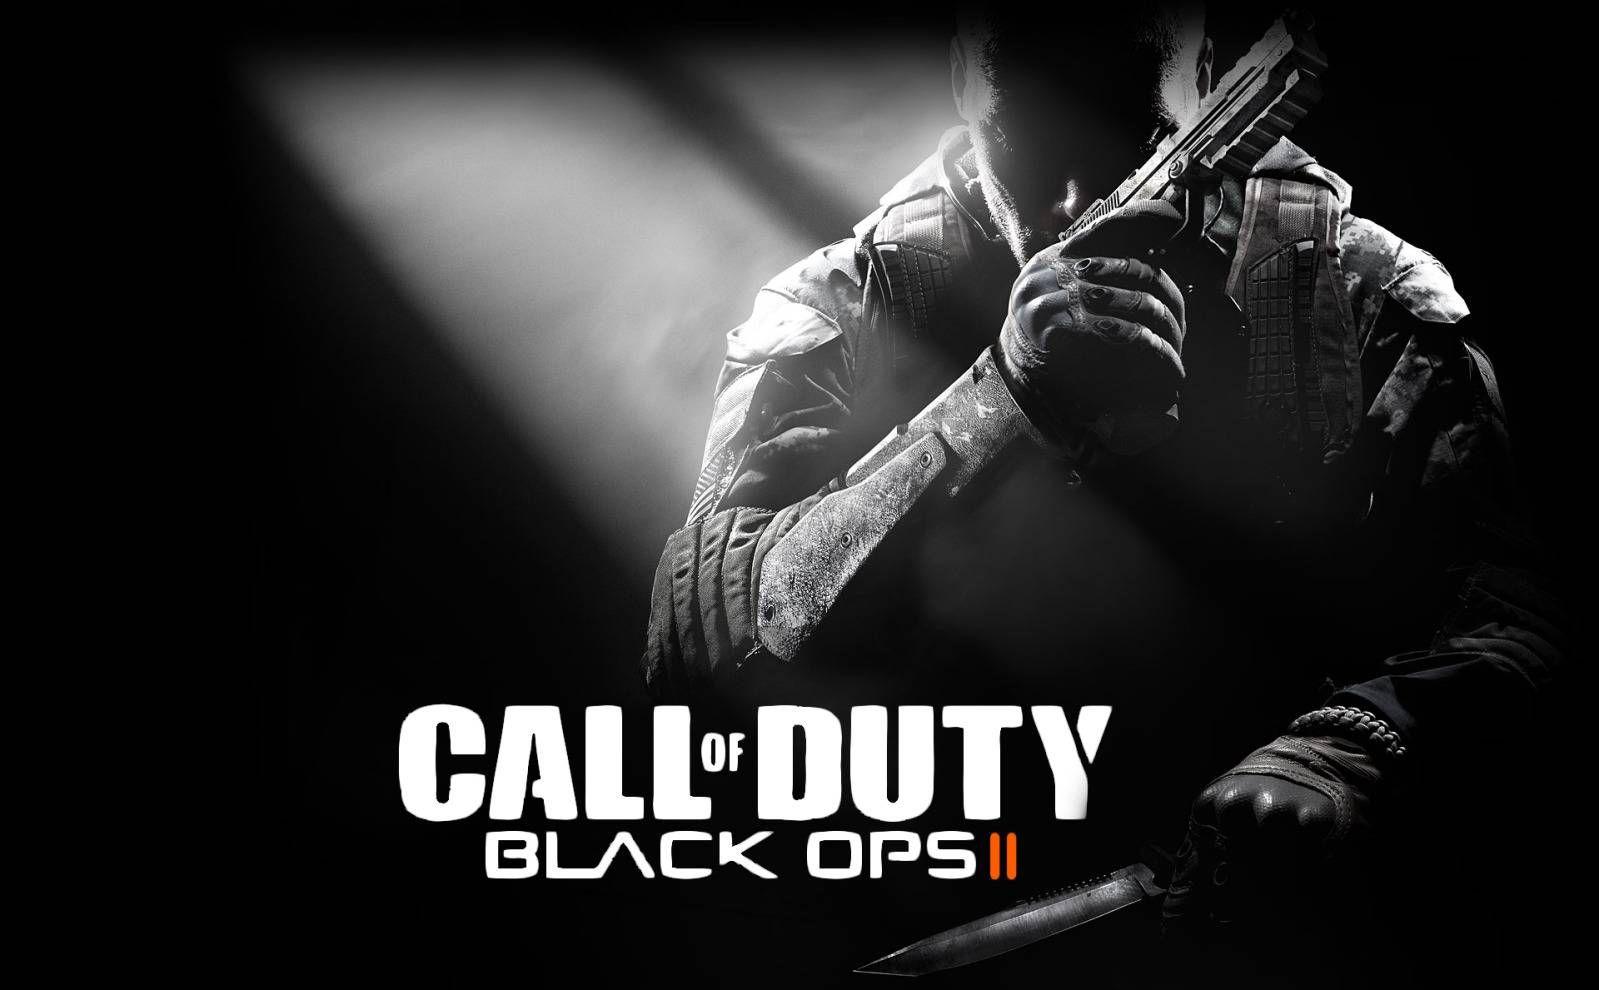 Call of Duty II PS4   Gamer life   Black ops, Call of duty